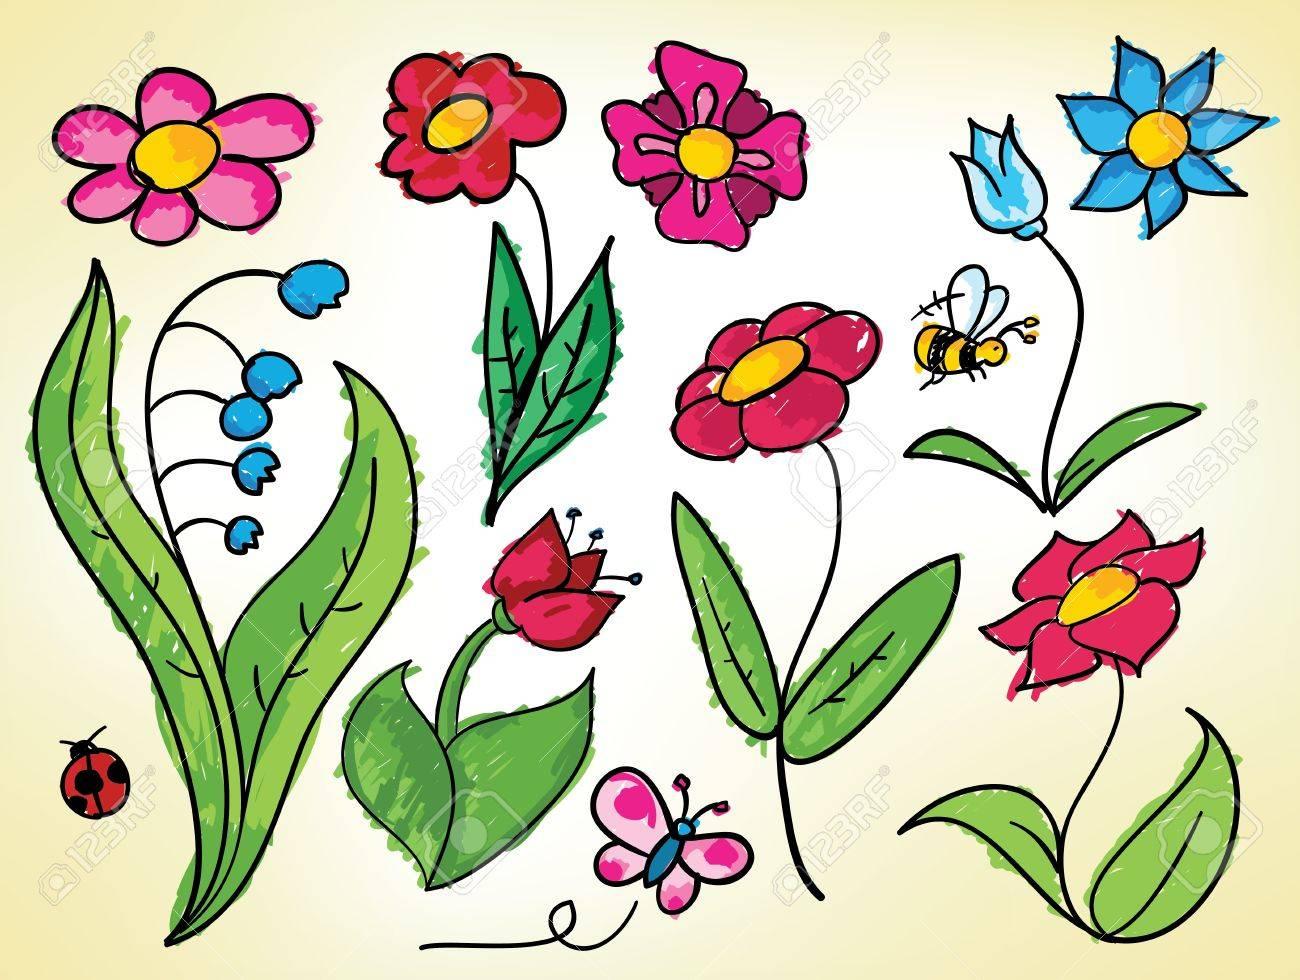 Dibujos Infantiles De Flores Bichos De Colores En Lineas